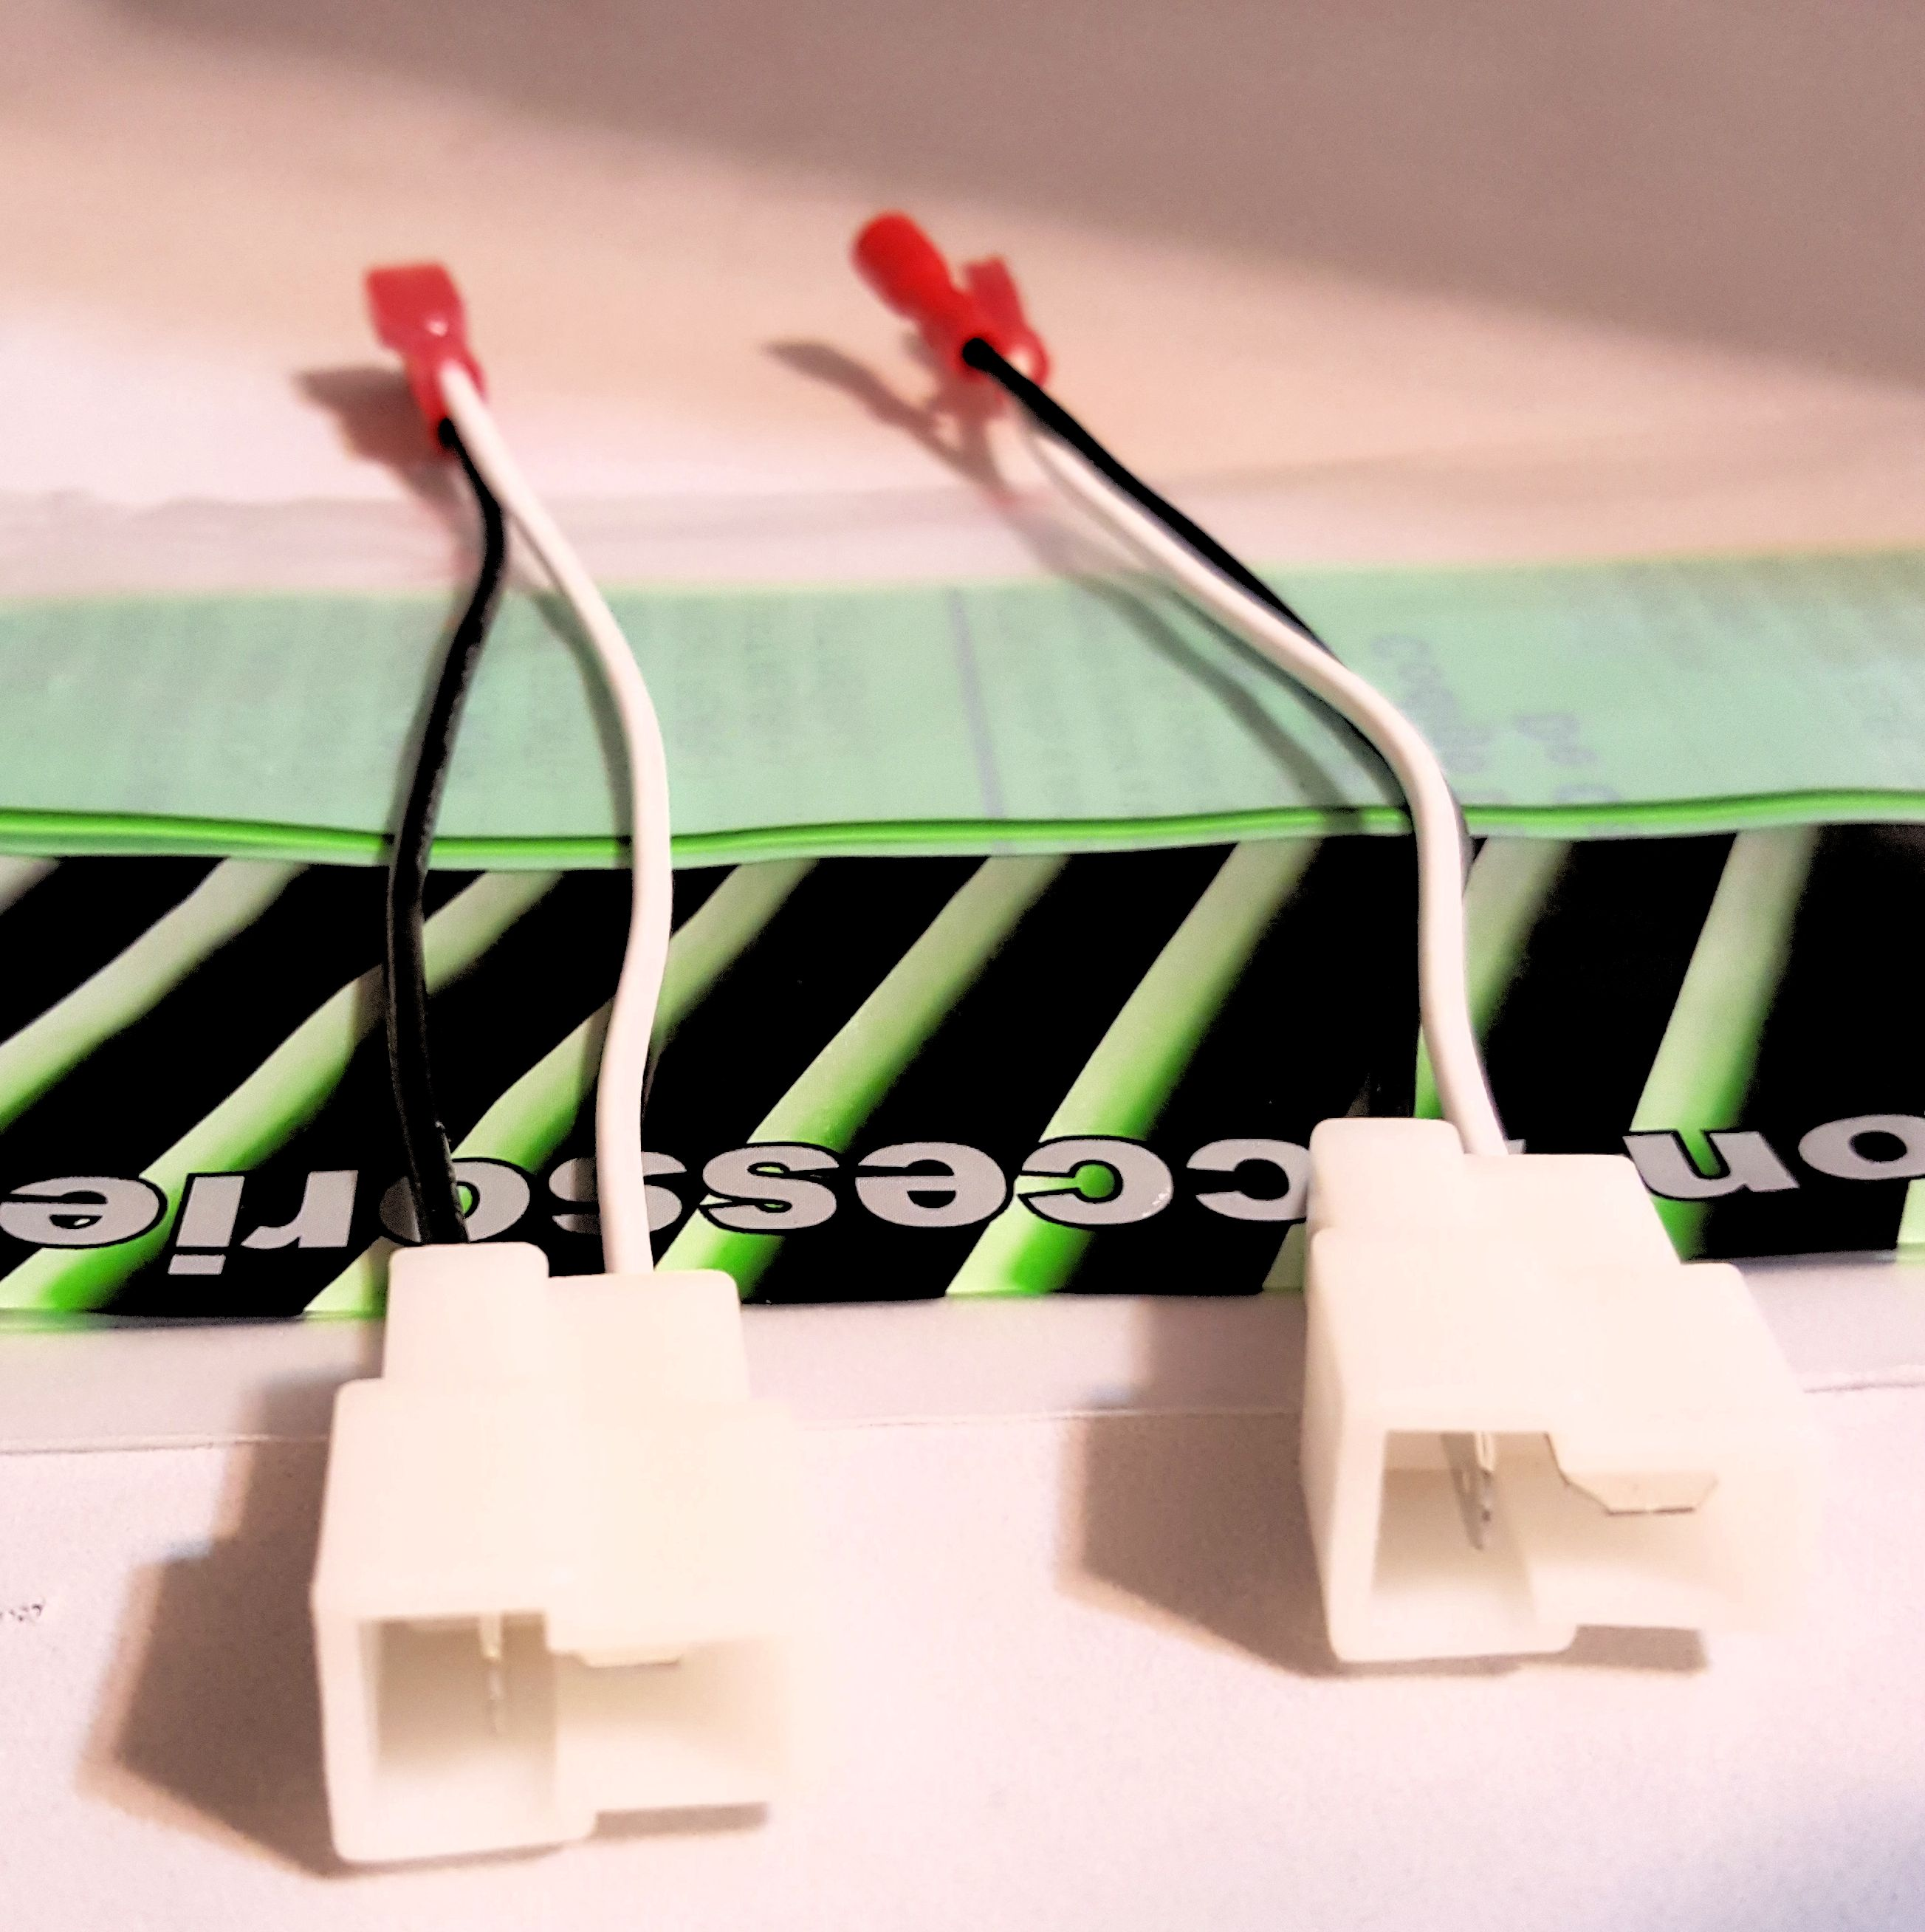 1980 1984 volkswagen rabbit speaker wire harness adapter. Black Bedroom Furniture Sets. Home Design Ideas